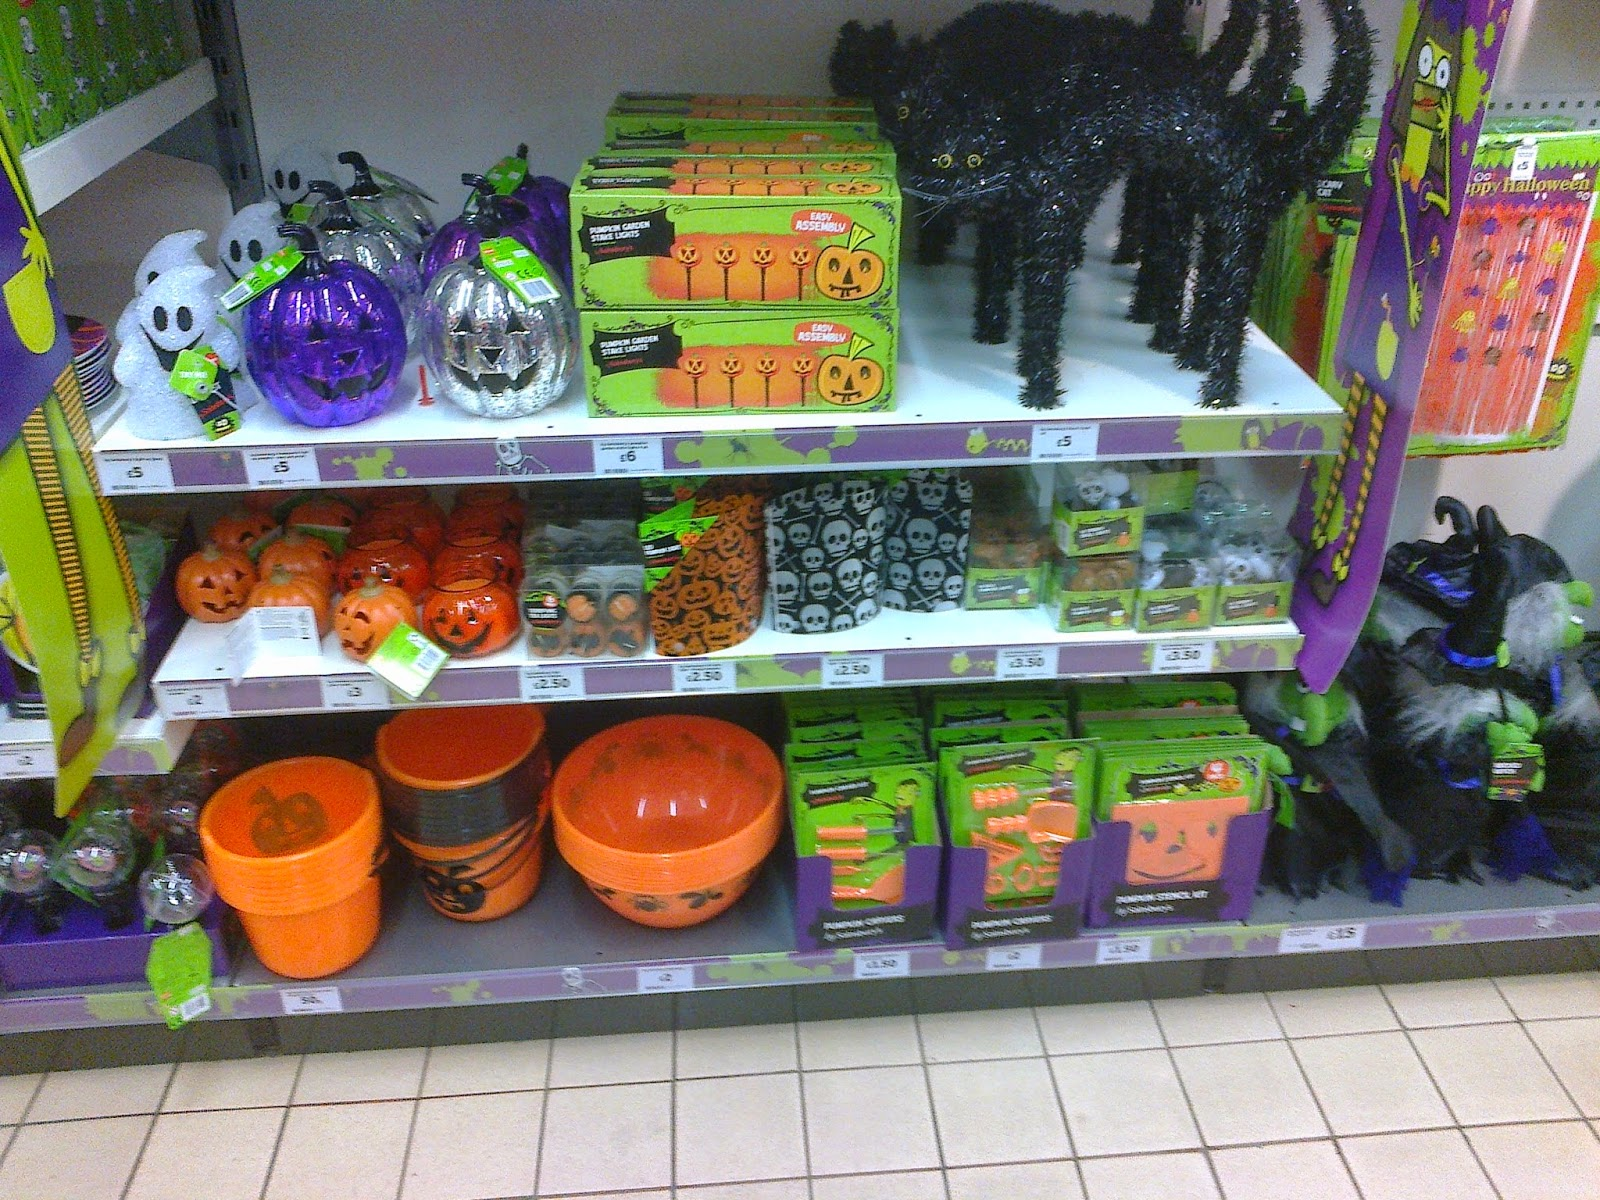 Halloween Cake Decorations Tesco : Halloween Vince s dark delights!: Sainsburys possibly ...